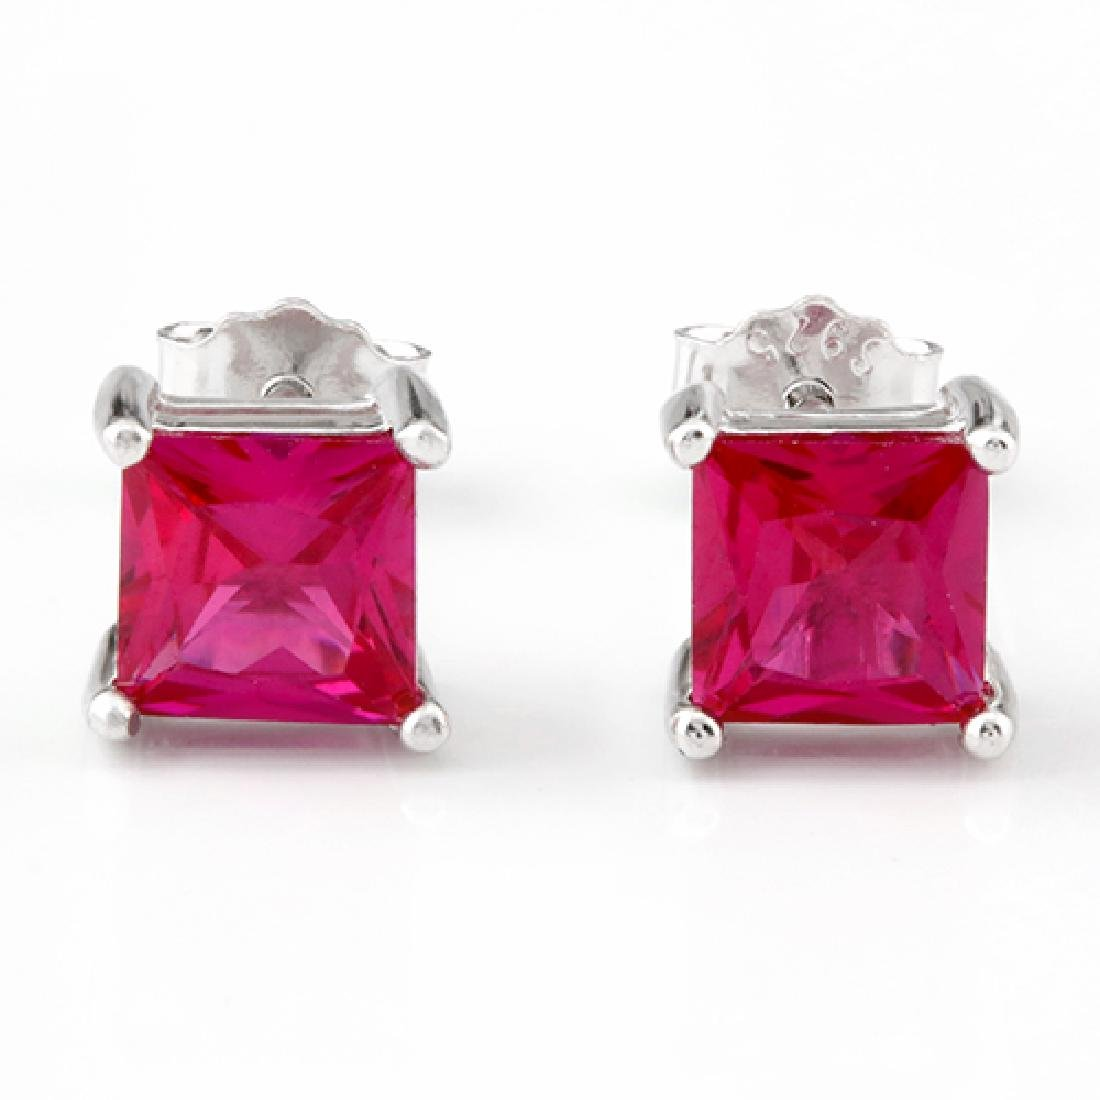 Lab Ruby Princess Cut Square Stud Earrings 5MM in